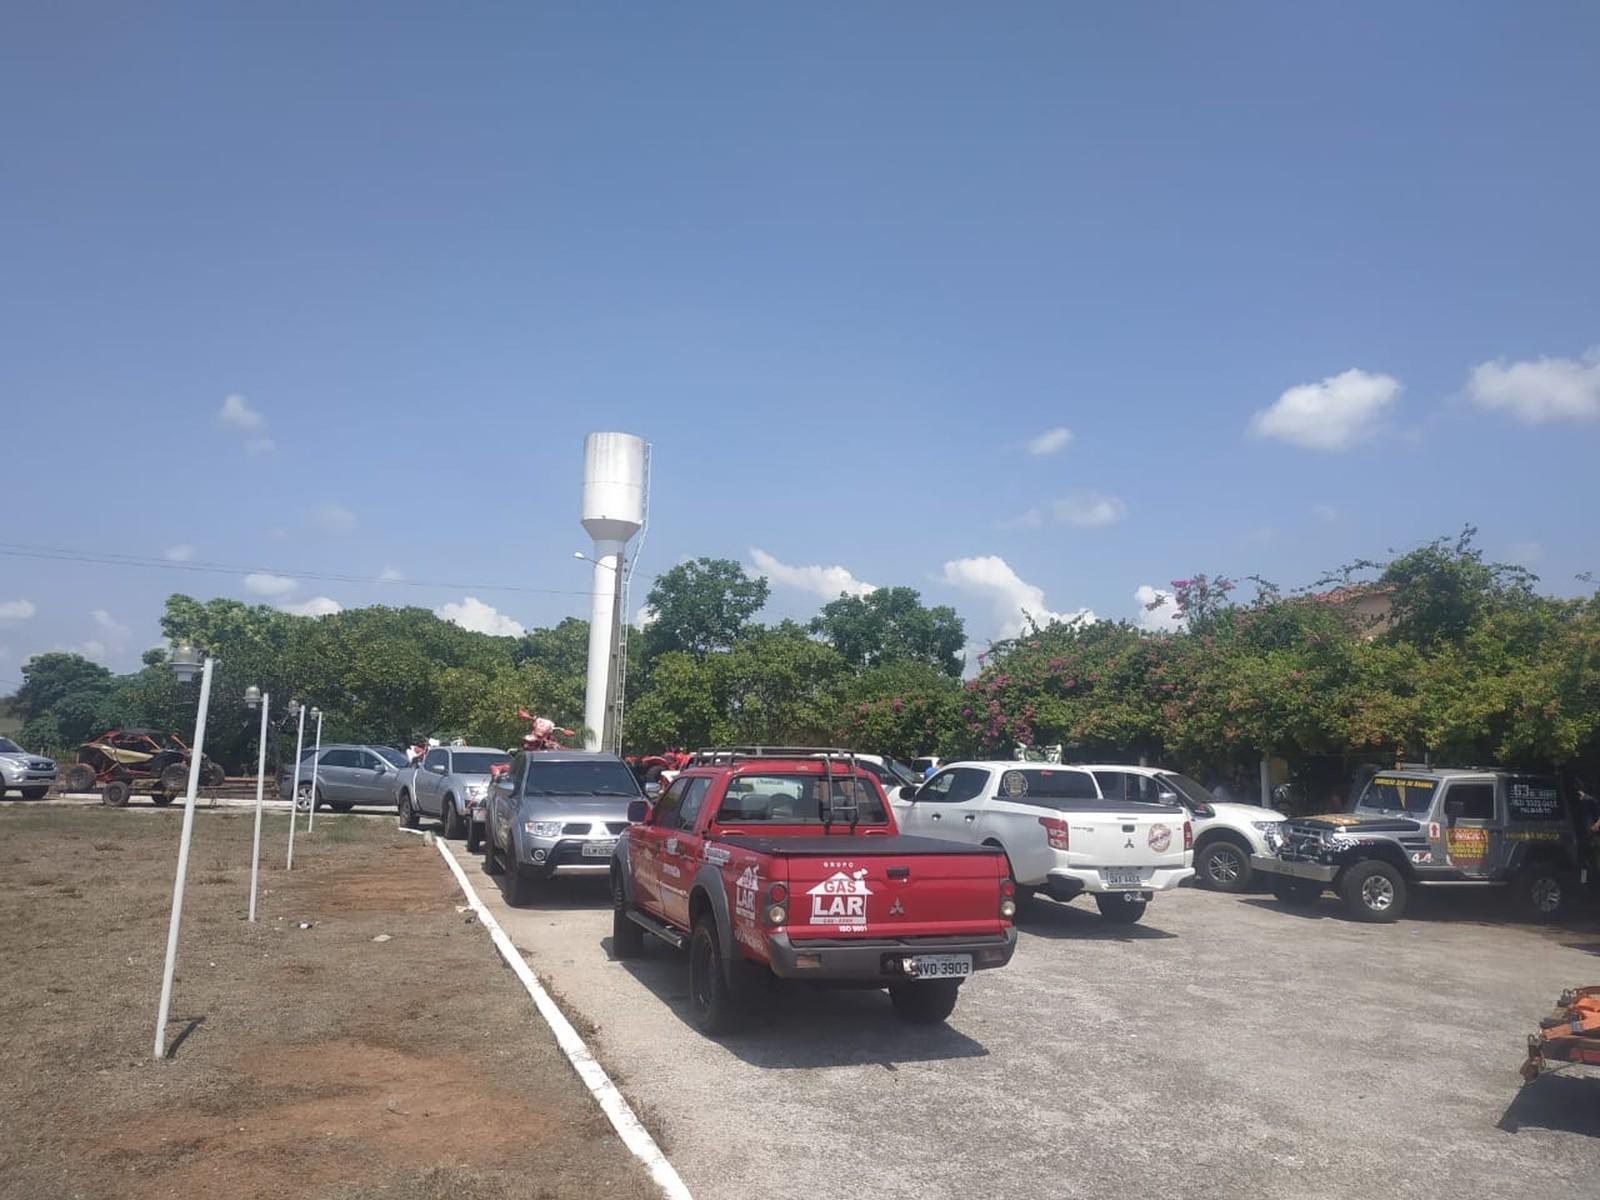 Rali que passaria dentro de terra indígena no Tocantins é suspenso pela Justiça